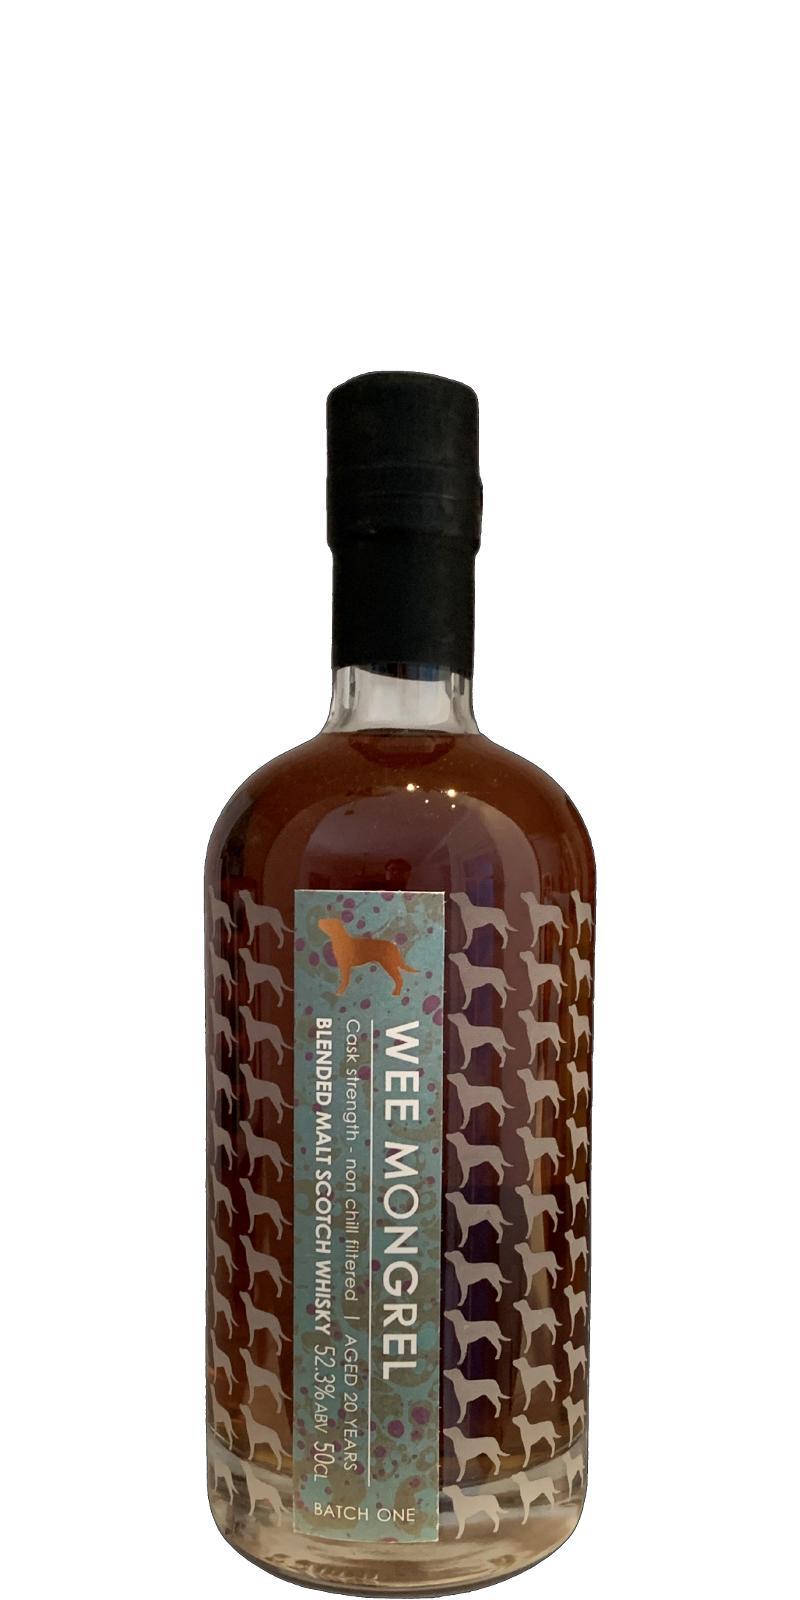 Blended Malt Scotch Whisky 20-year-old LBDS